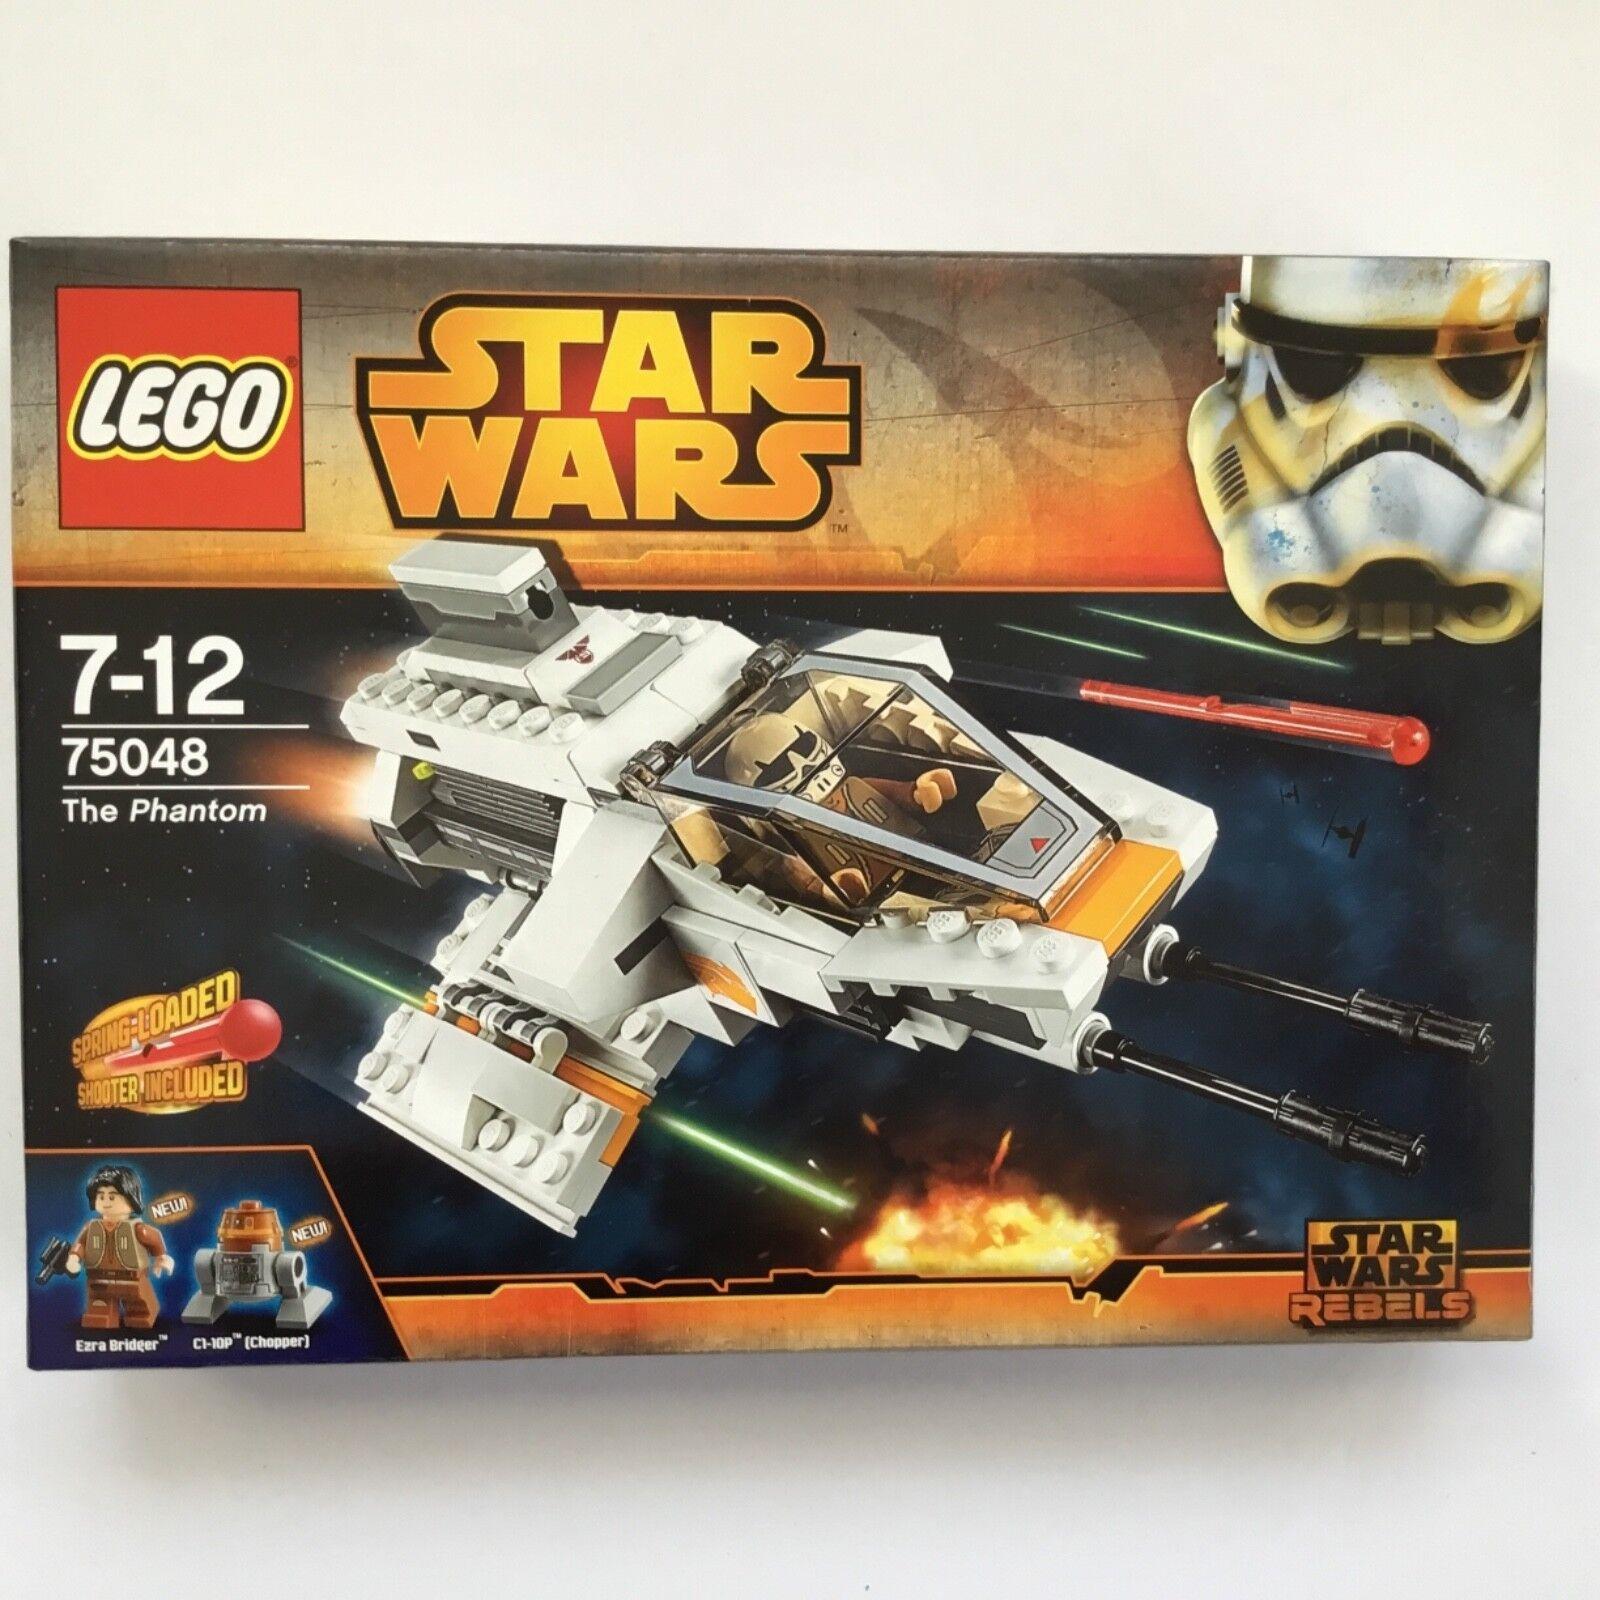 LEGO StarWars 75048 - The Phantom - NEU OVP